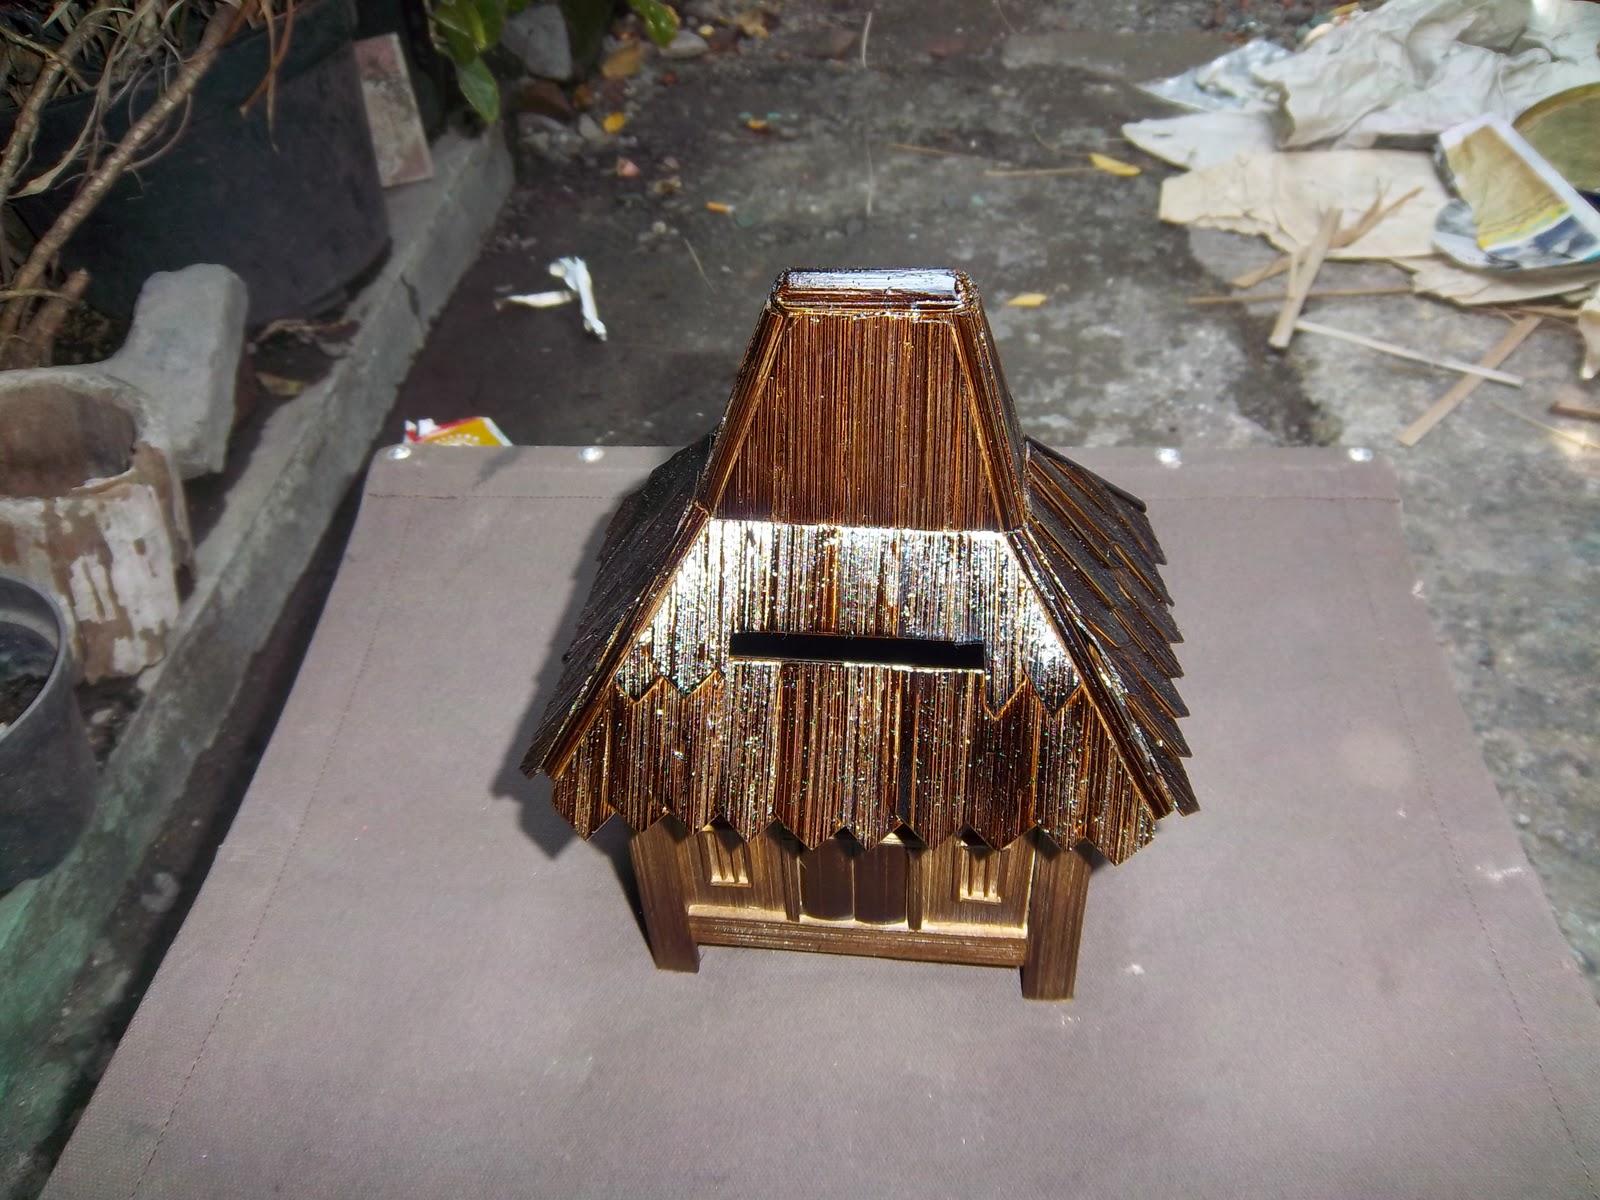 yogyakarta craft celengan bambu bentuk rumah adat jawa